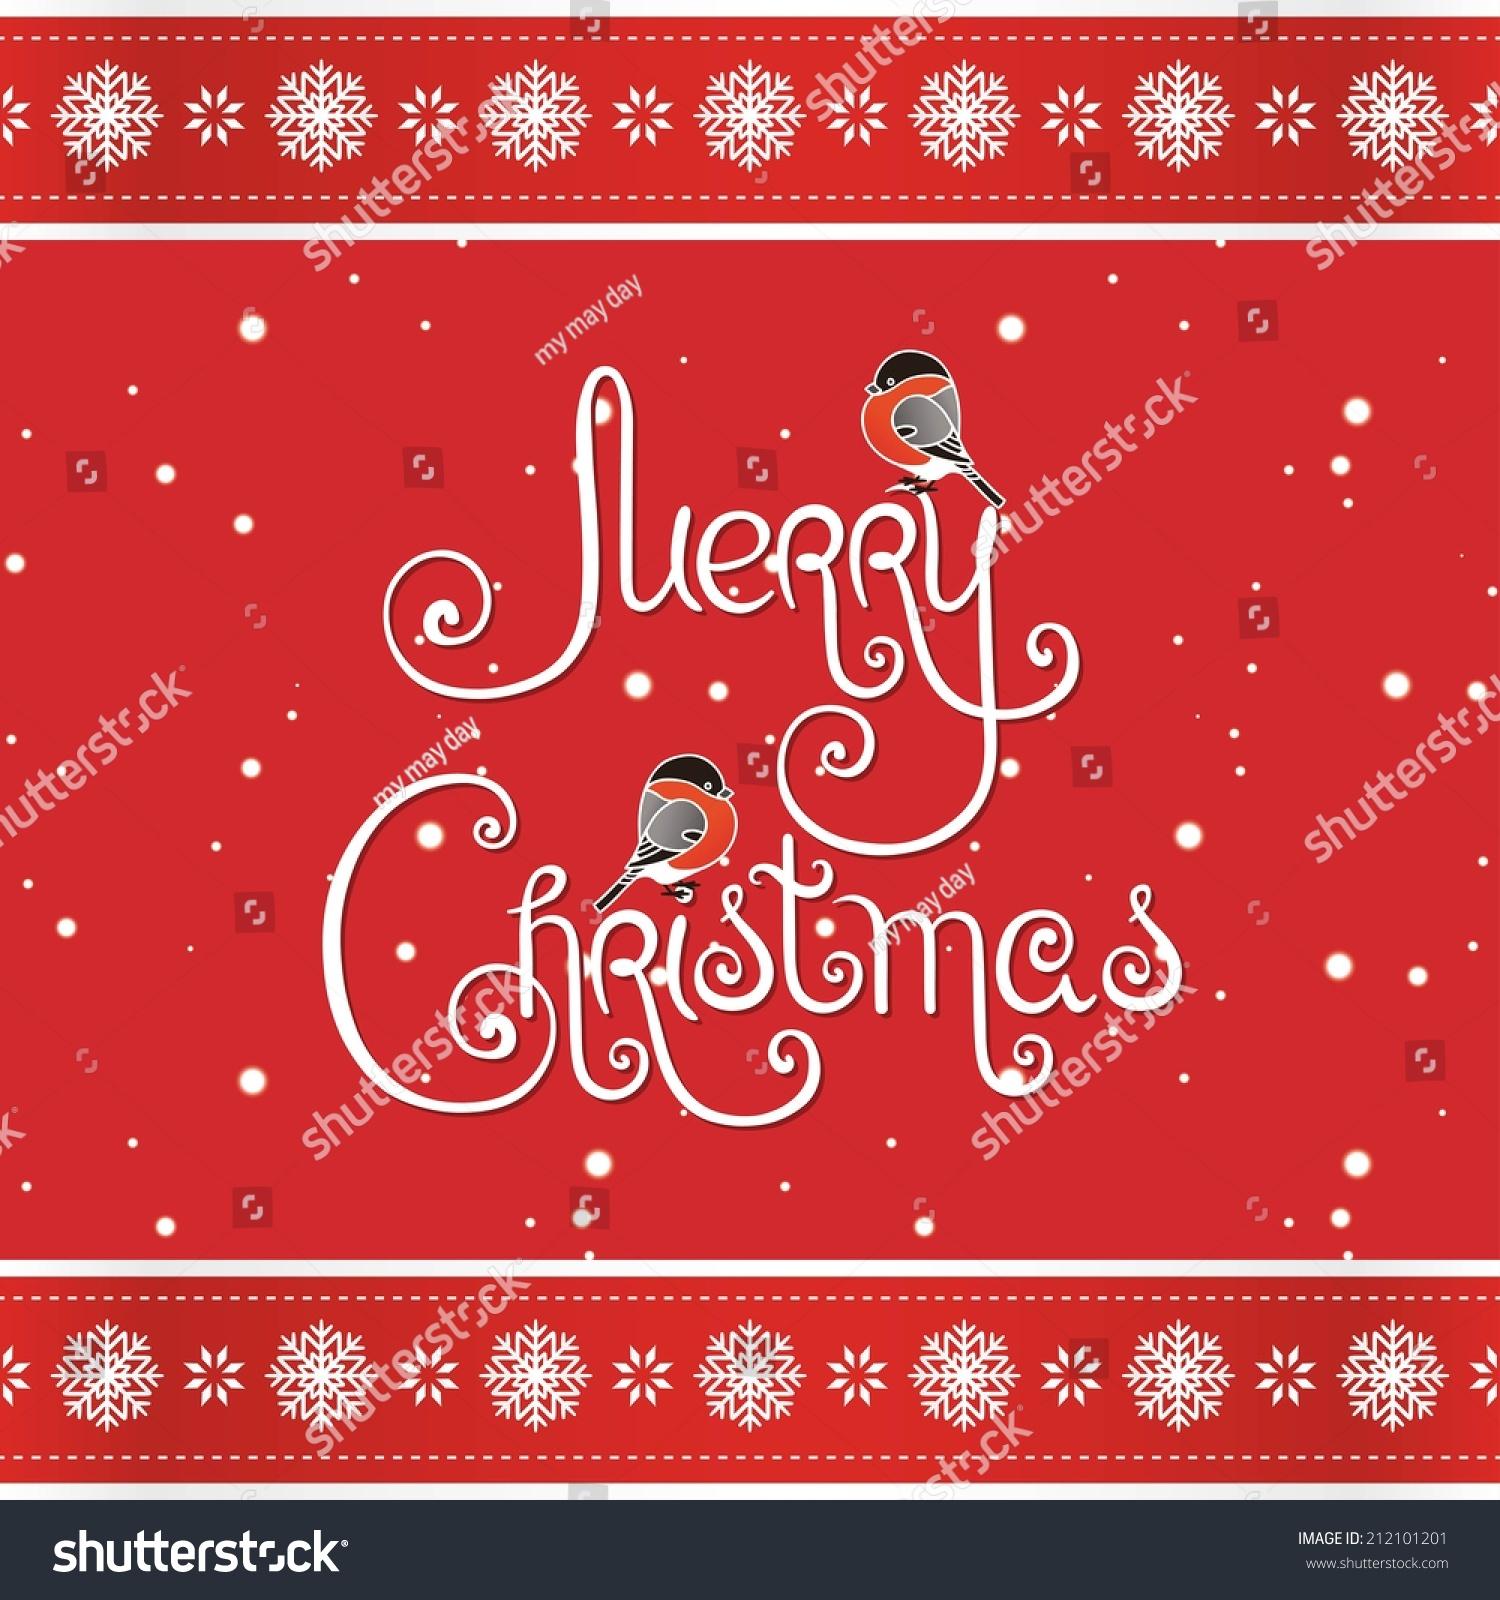 Merry Christmas Greeting Card Handwritten Words Stock Vector